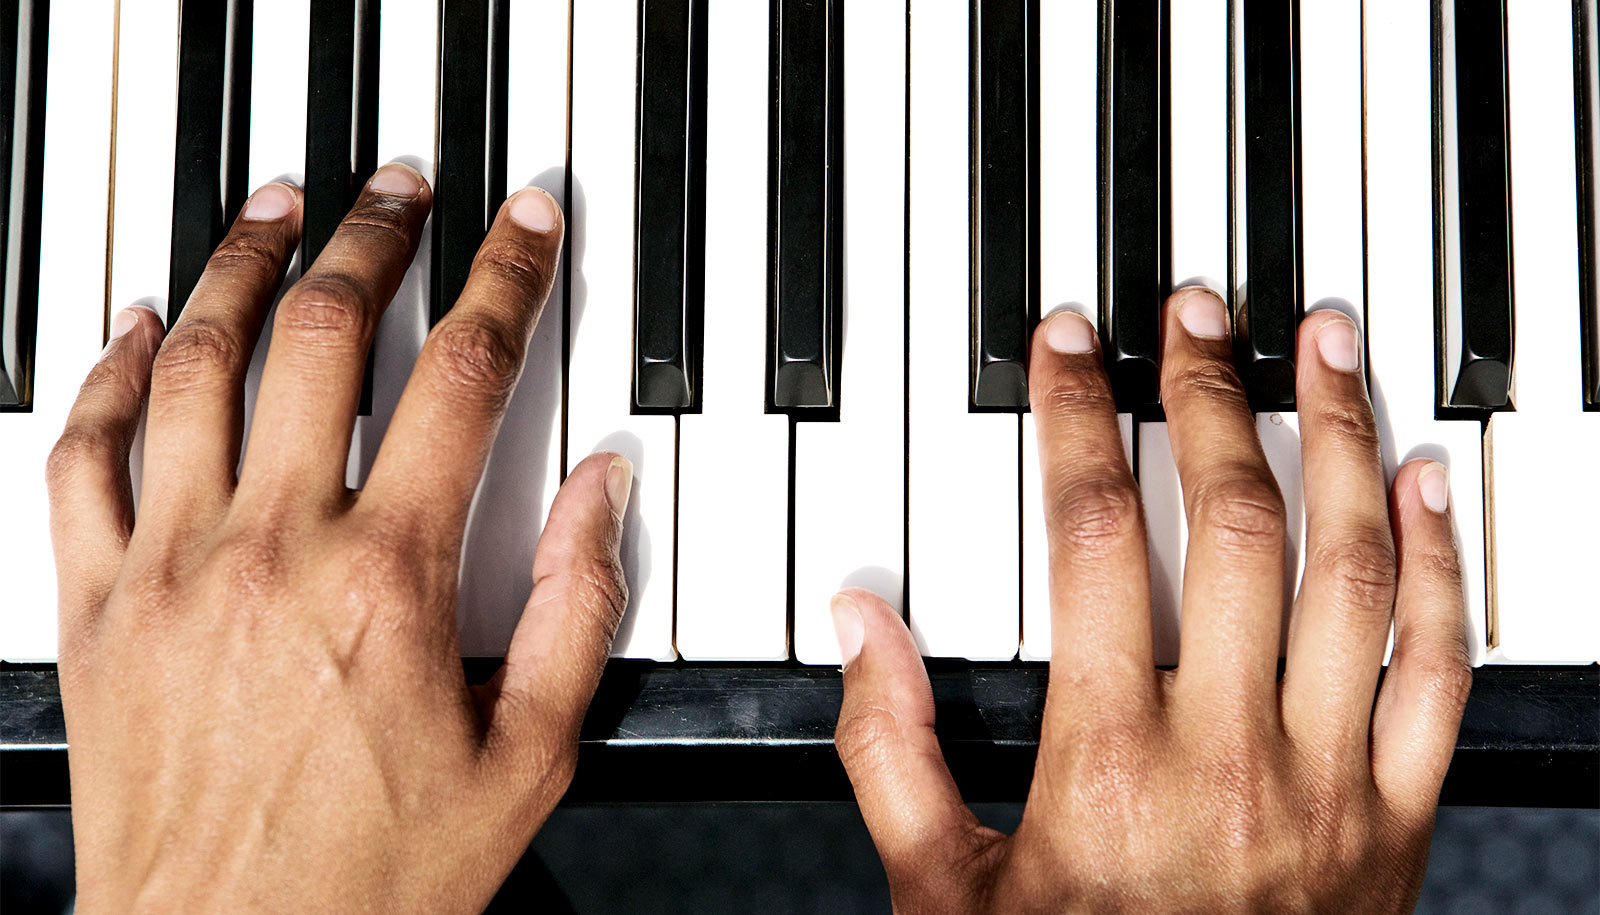 Does Learning Music Hinge on Smarts, Not Mindset?